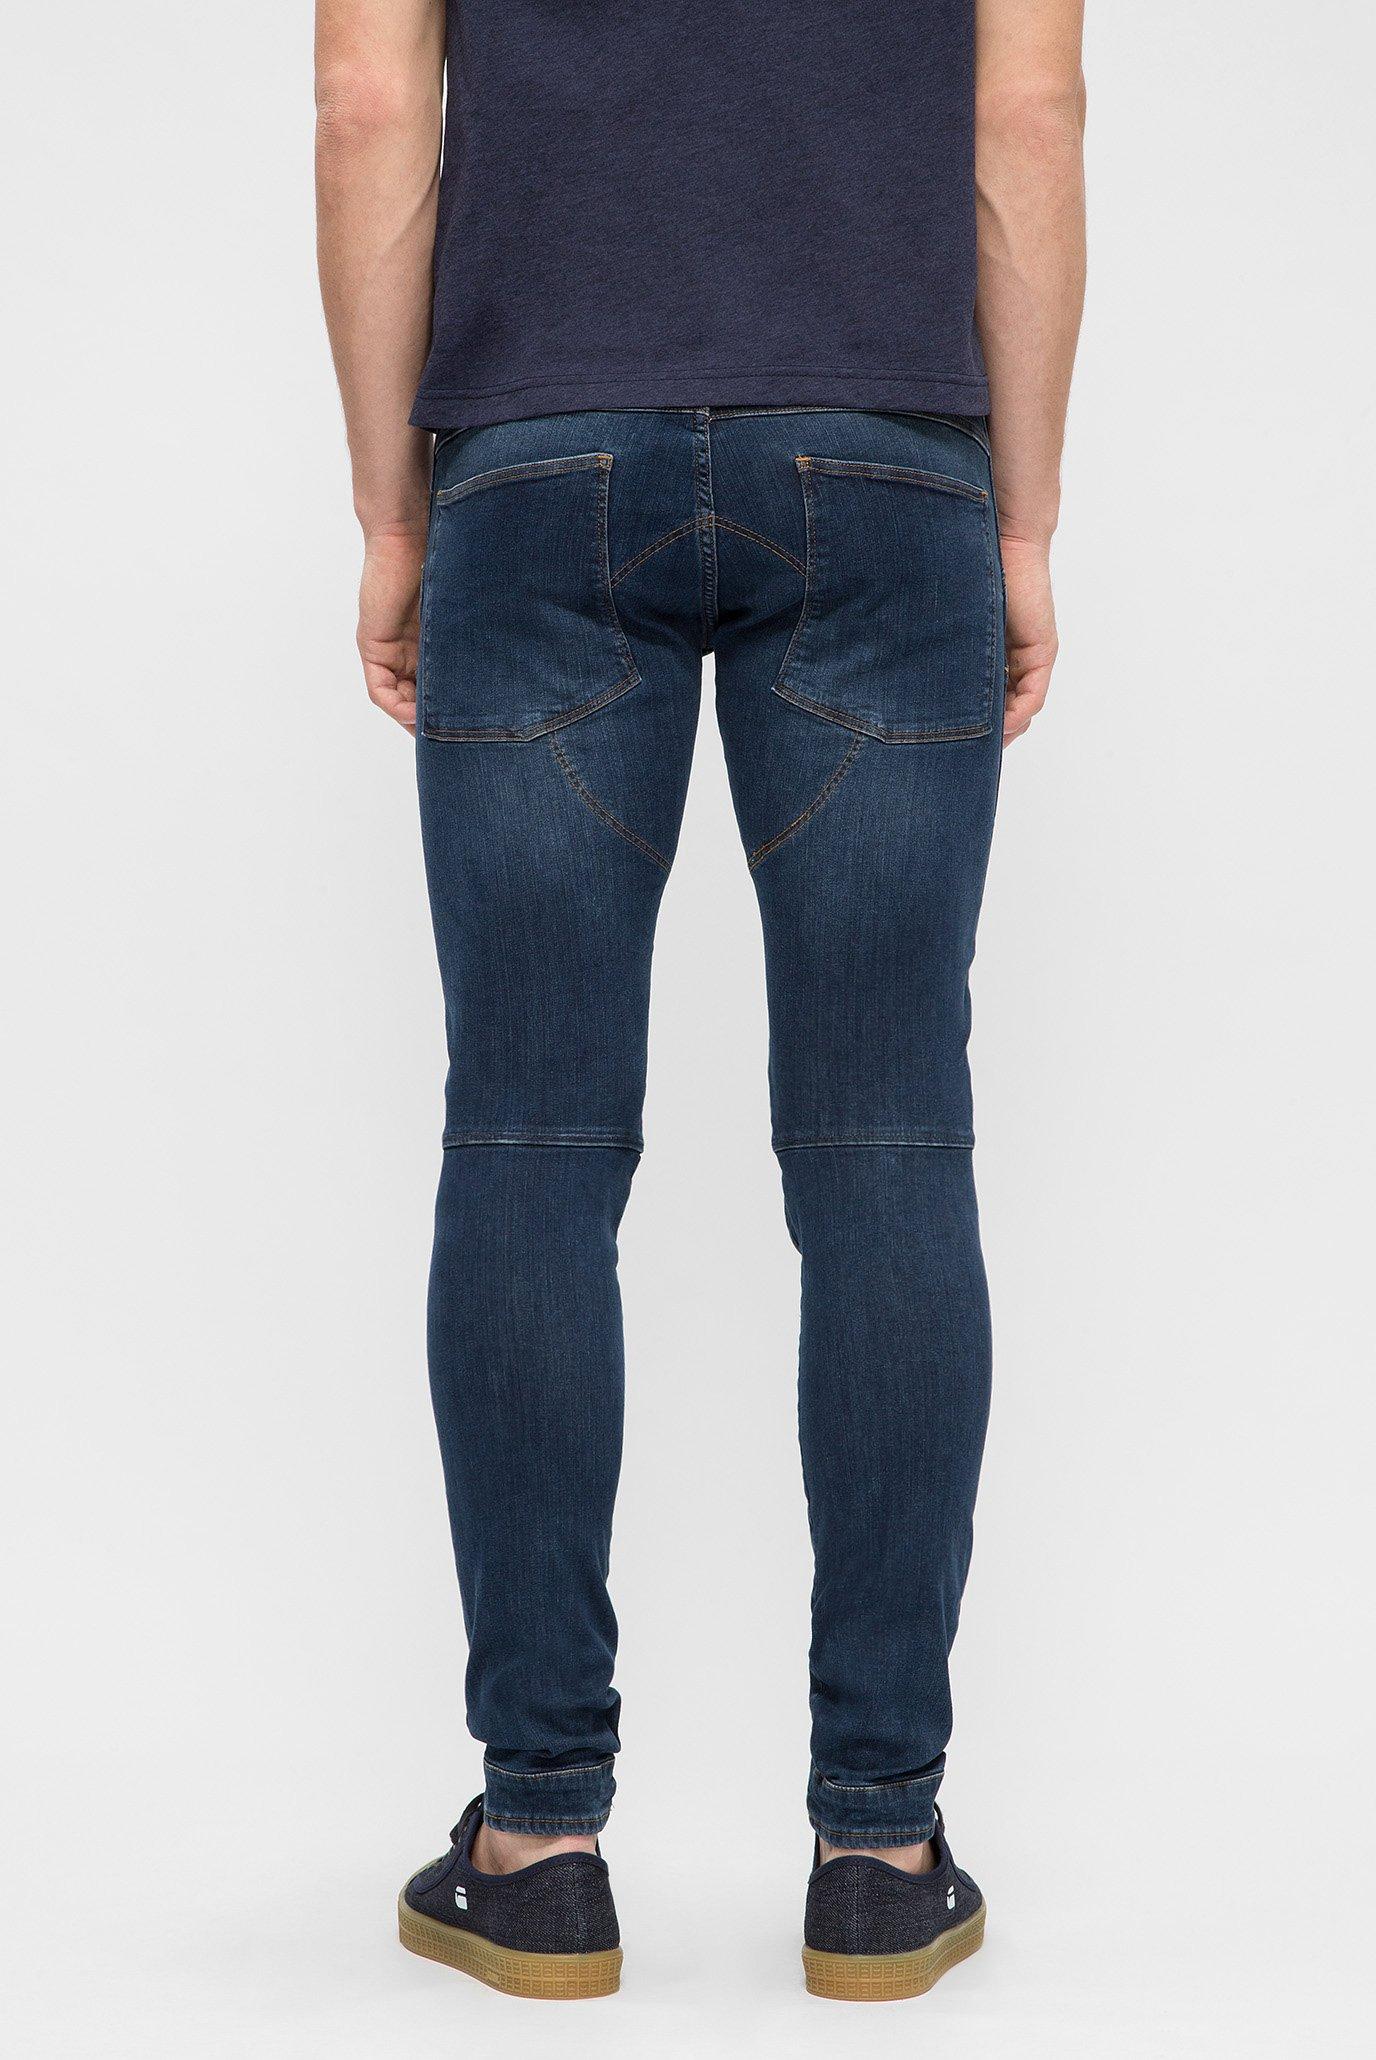 Мужские синие джинсы 3D Super Slim G-Star RAW